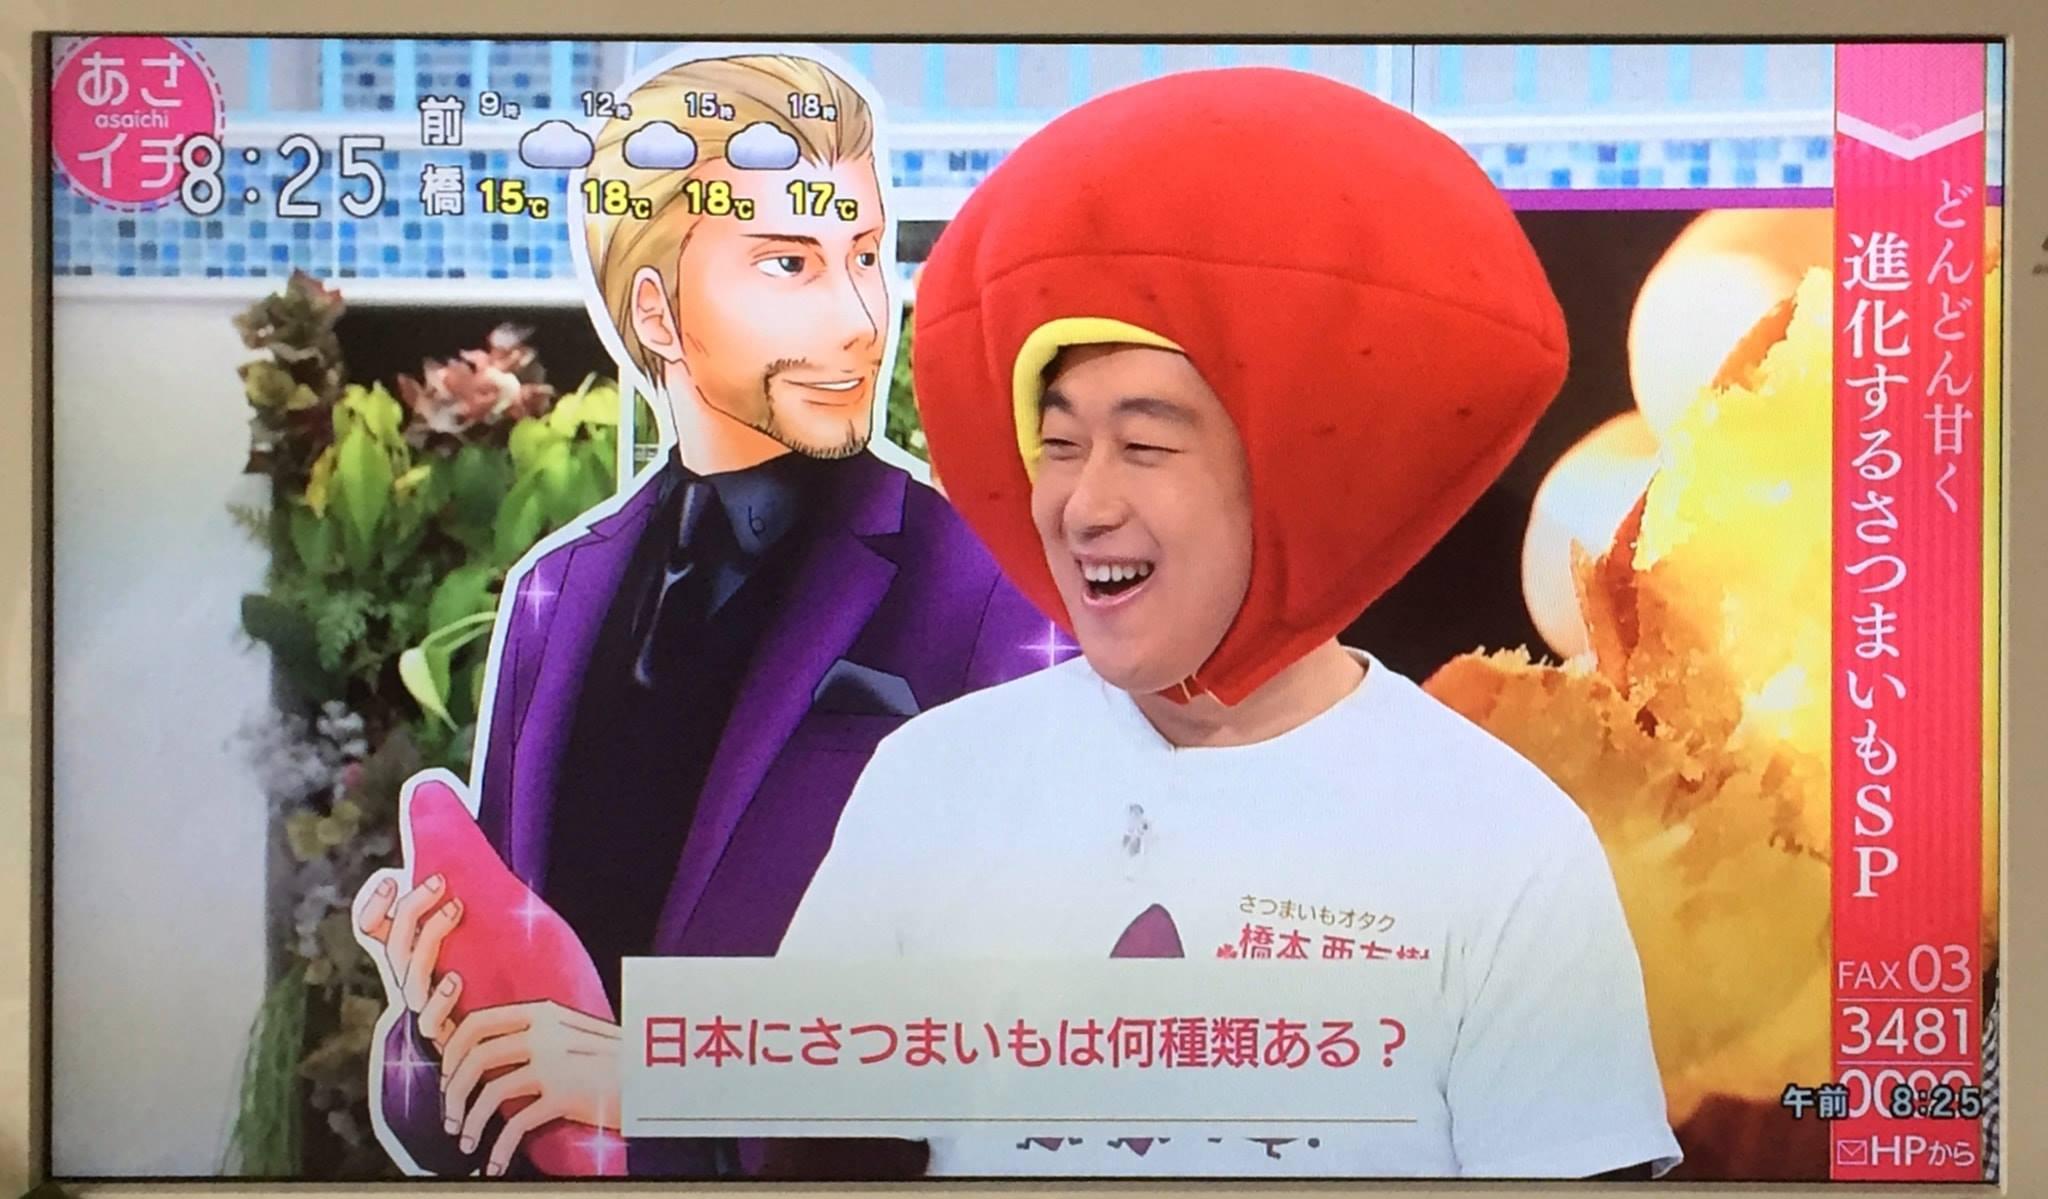 NHKあさイチに出演してサツマイモ愛を全国に届けました